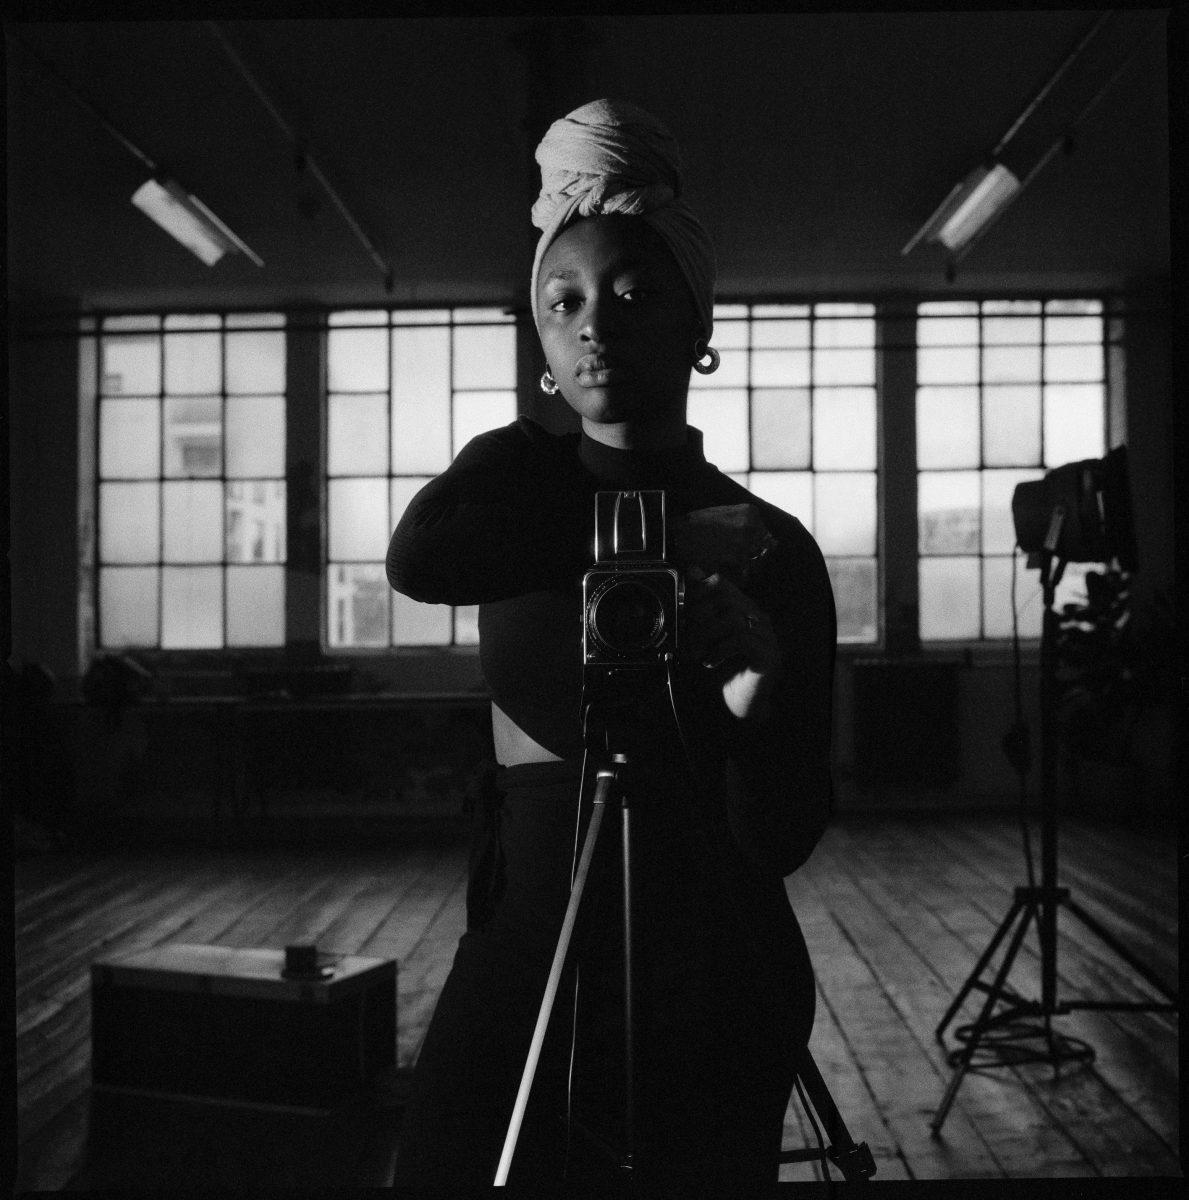 Adama Jalloh, The Self Portrait at HOME, 2020. Courtesy Ronan McKenzie/WePresent